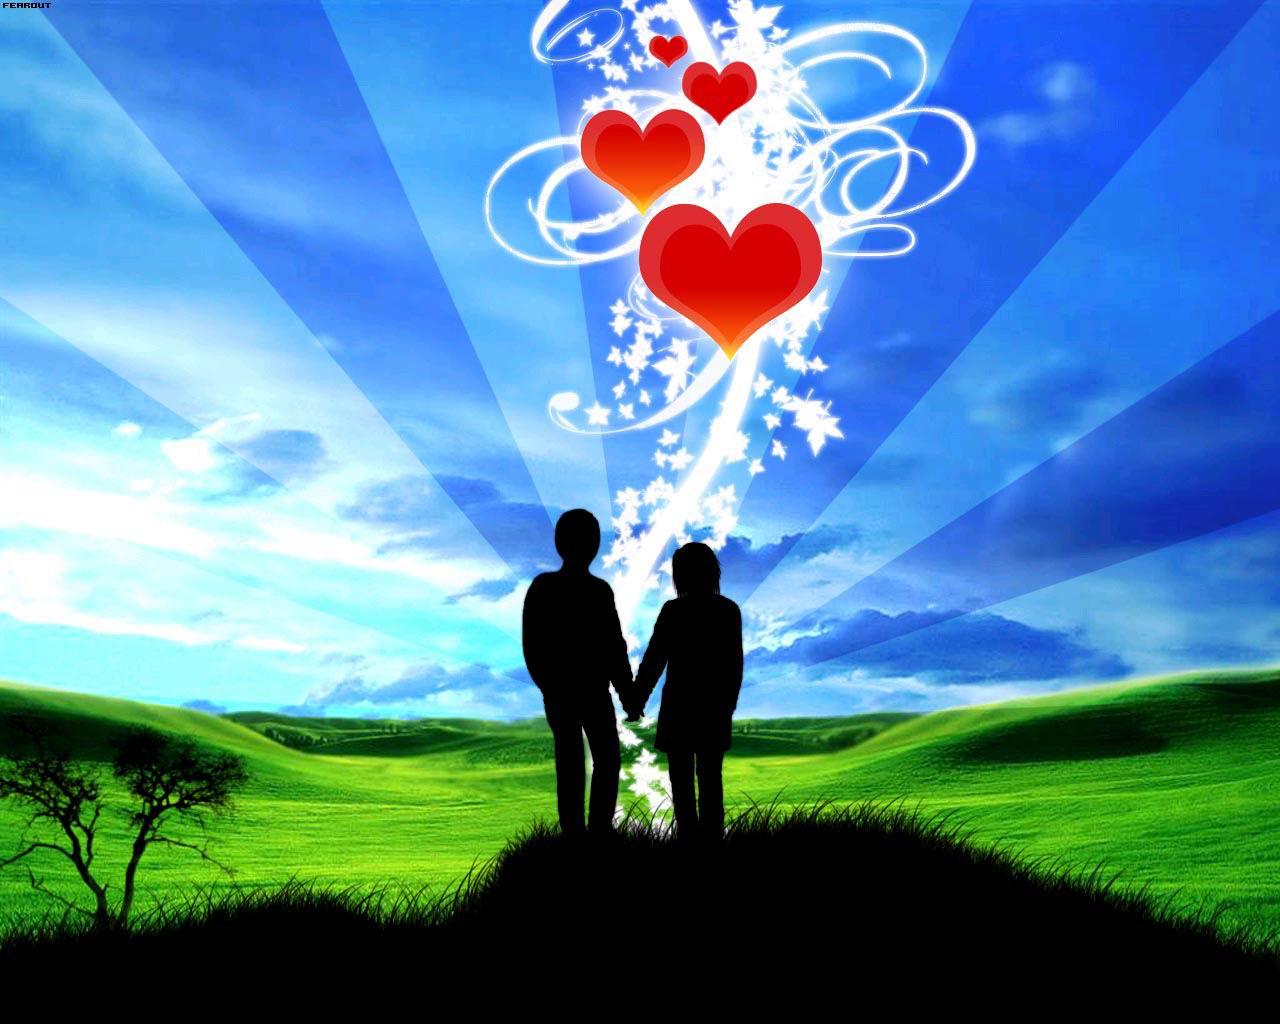 Gambar Romantis Animasi Kartun Kata Cinta - Gambar Foto ...